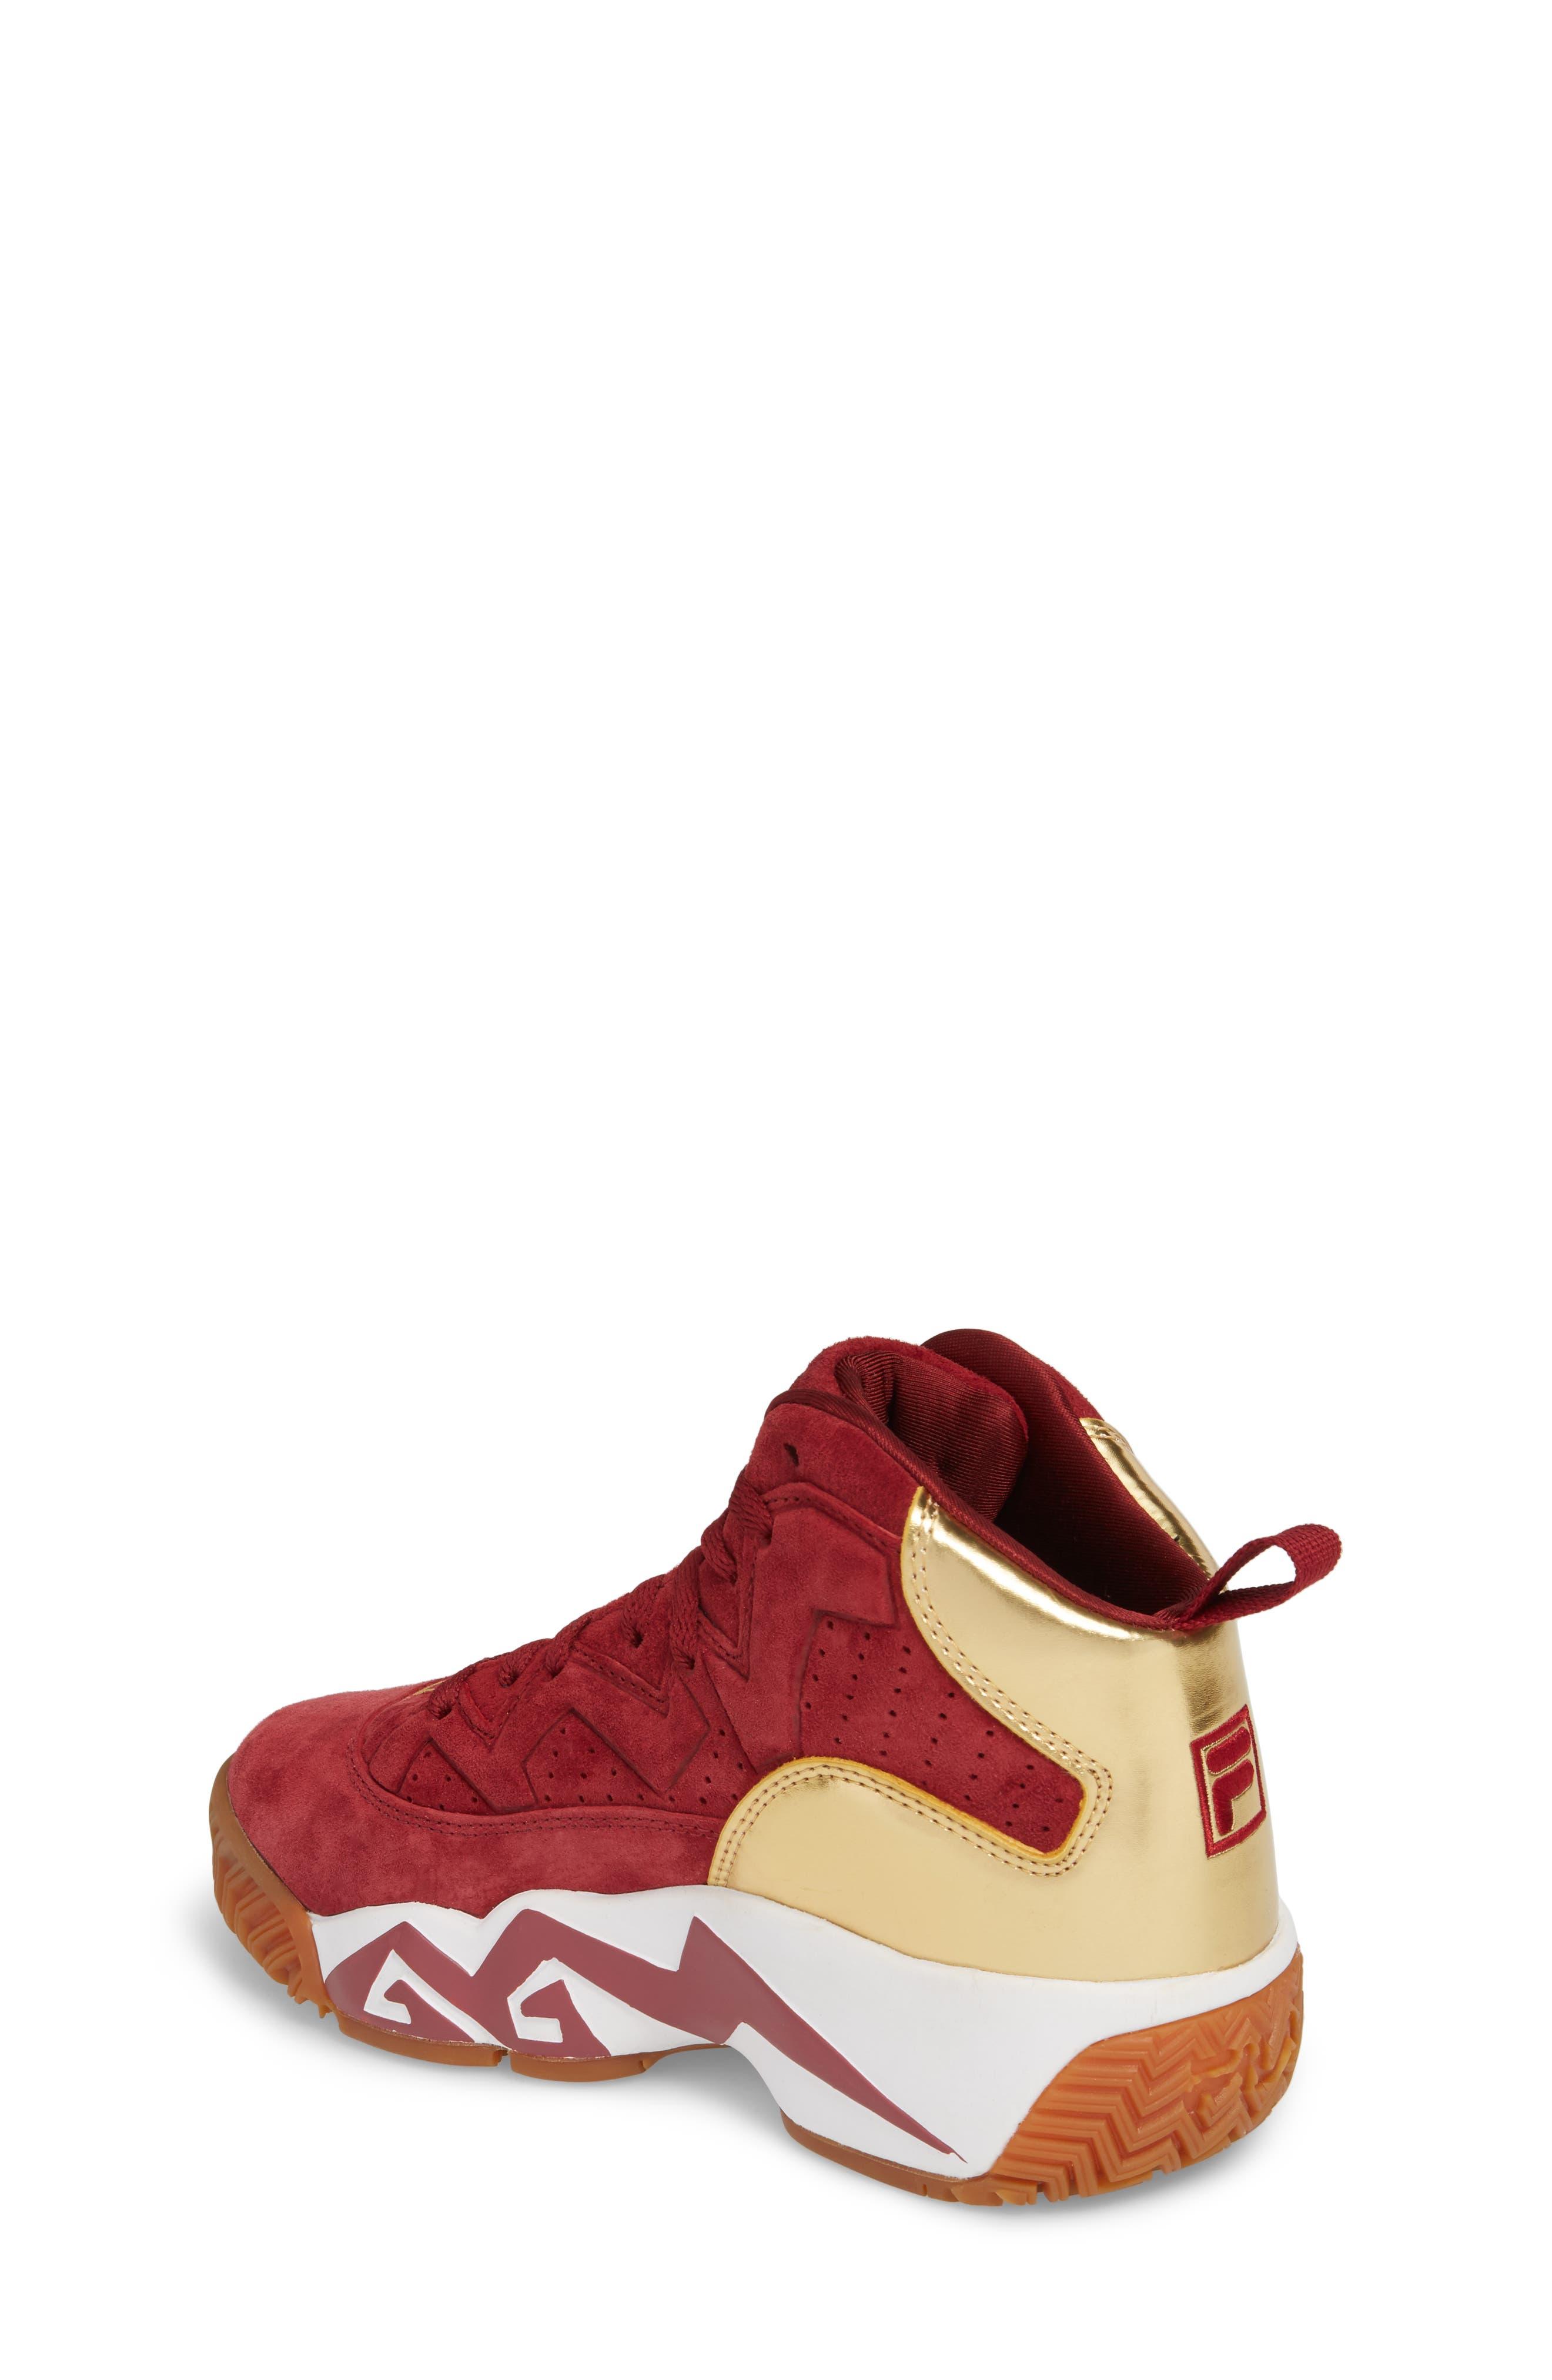 Heritage Sneaker,                             Alternate thumbnail 2, color,                             635